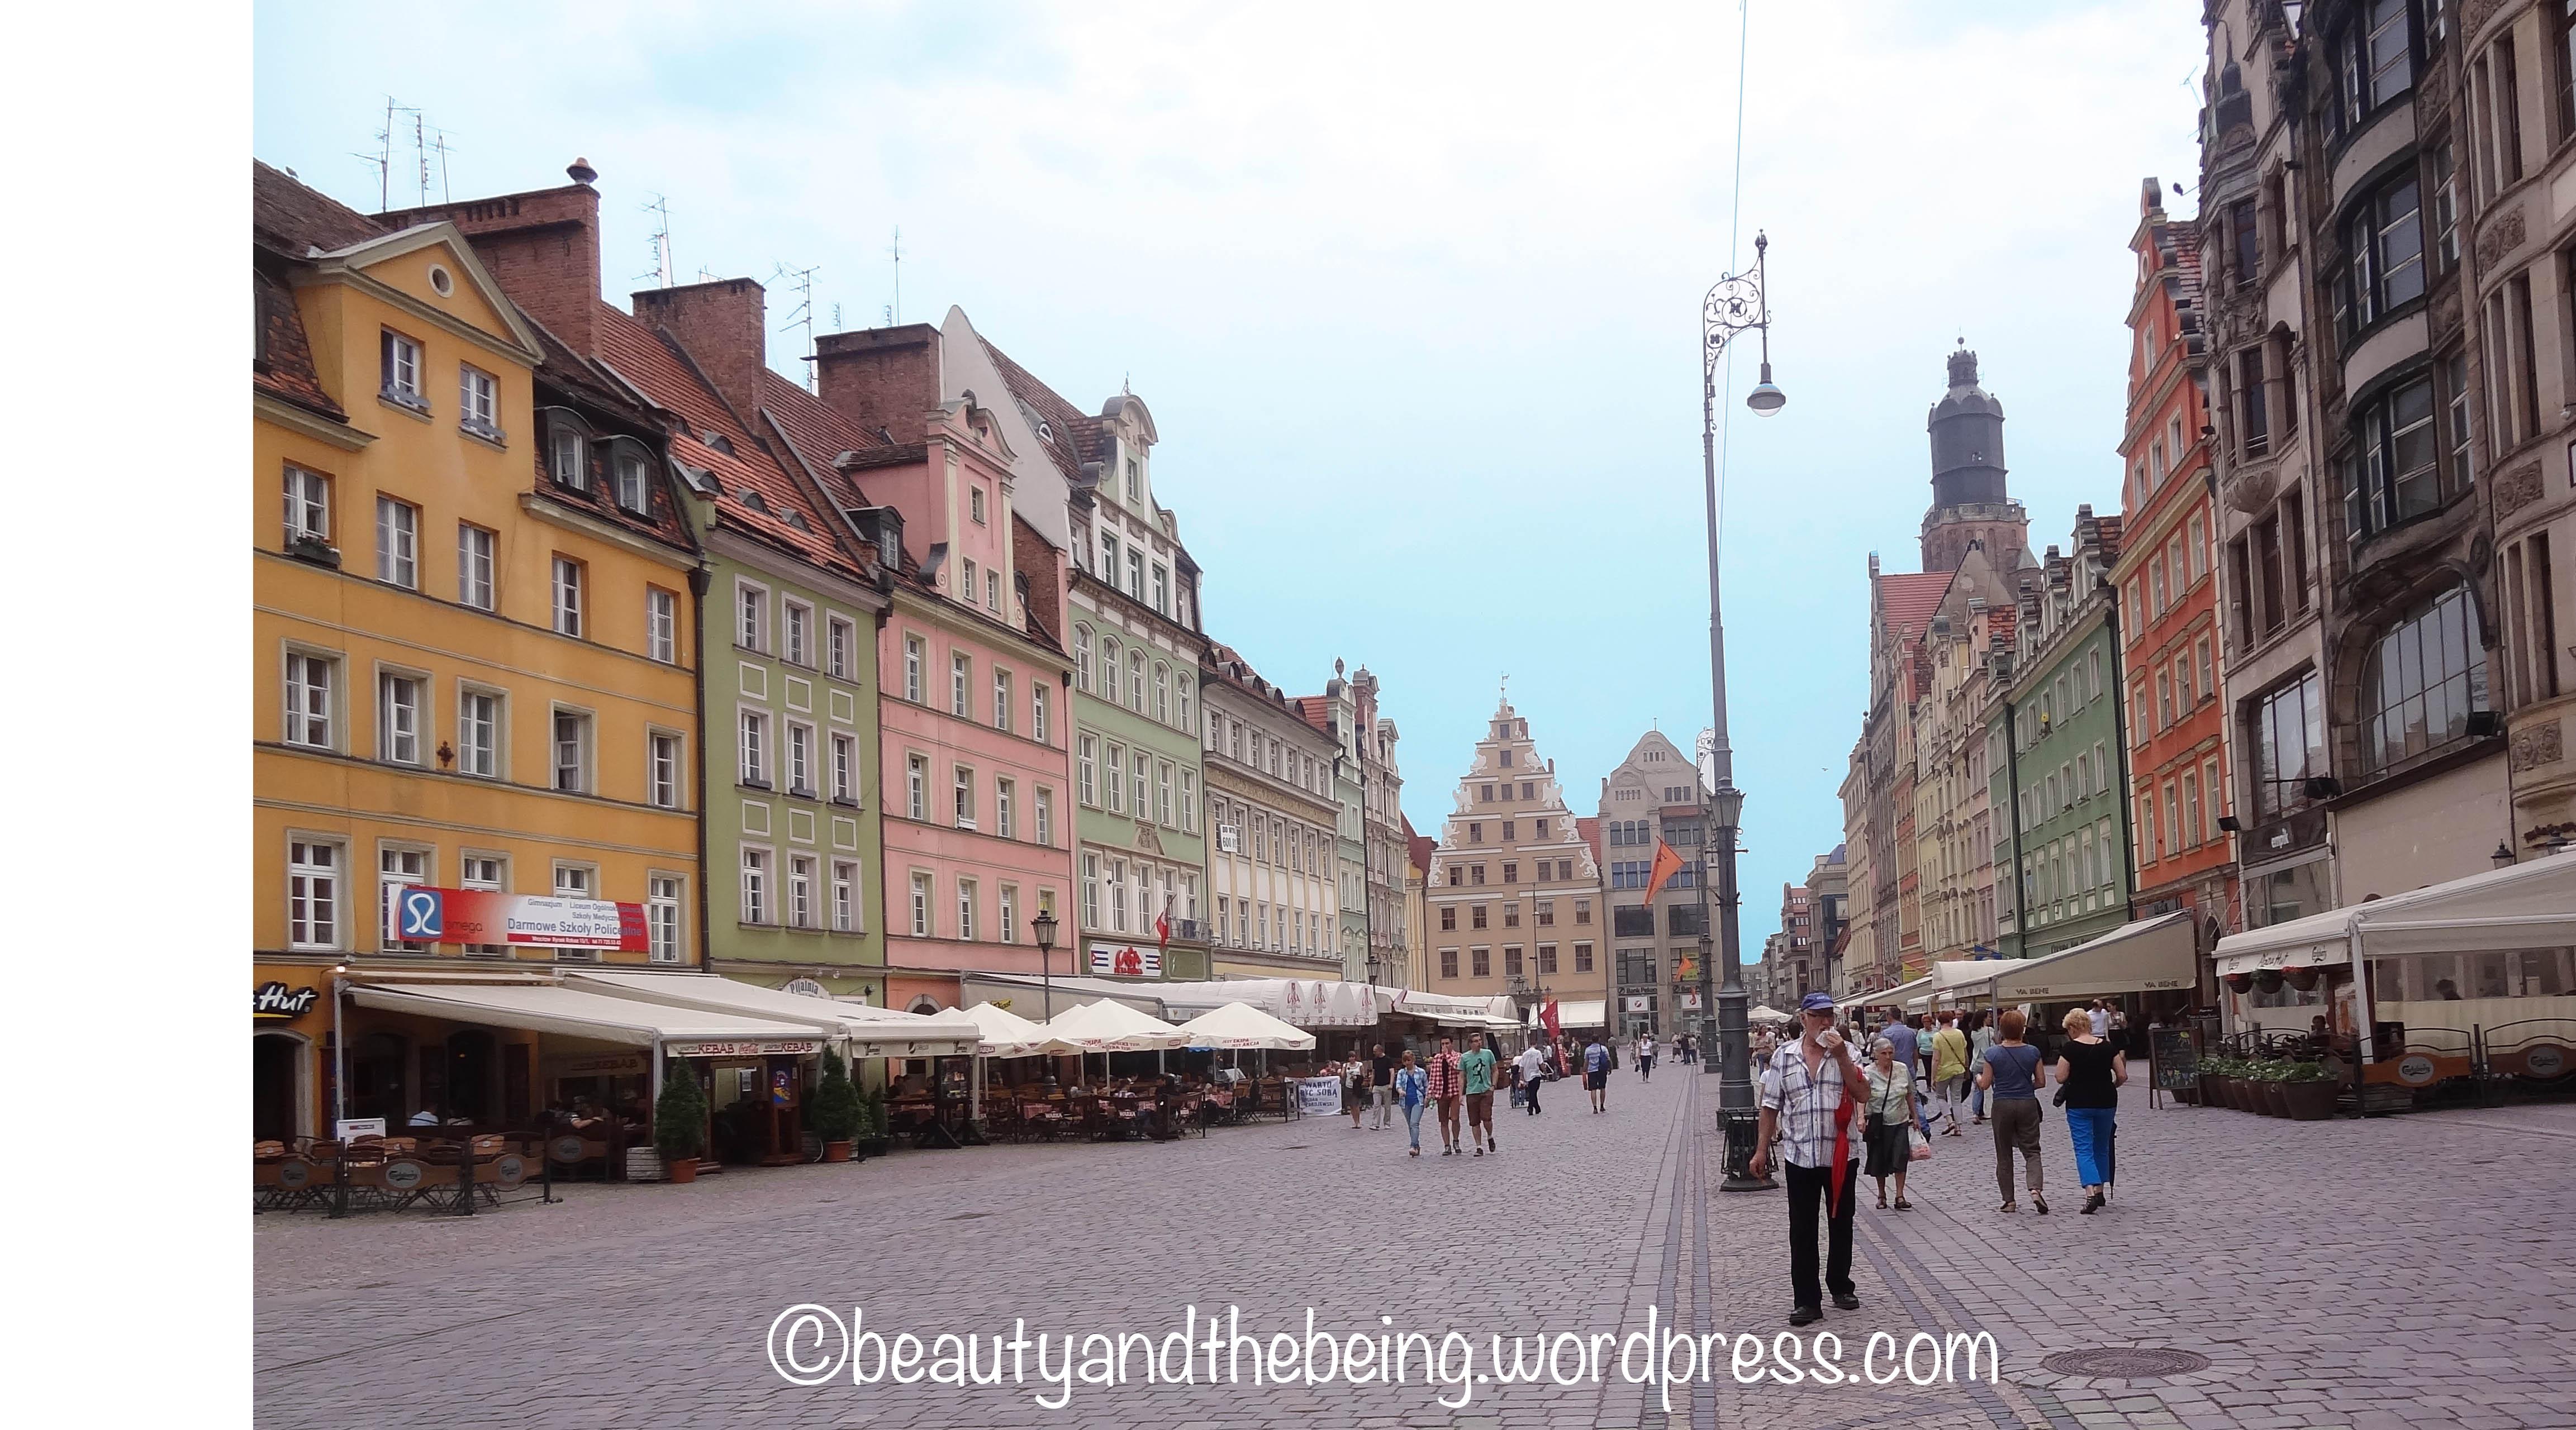 Wroclaw- beautyandthebeing.wordpress.com